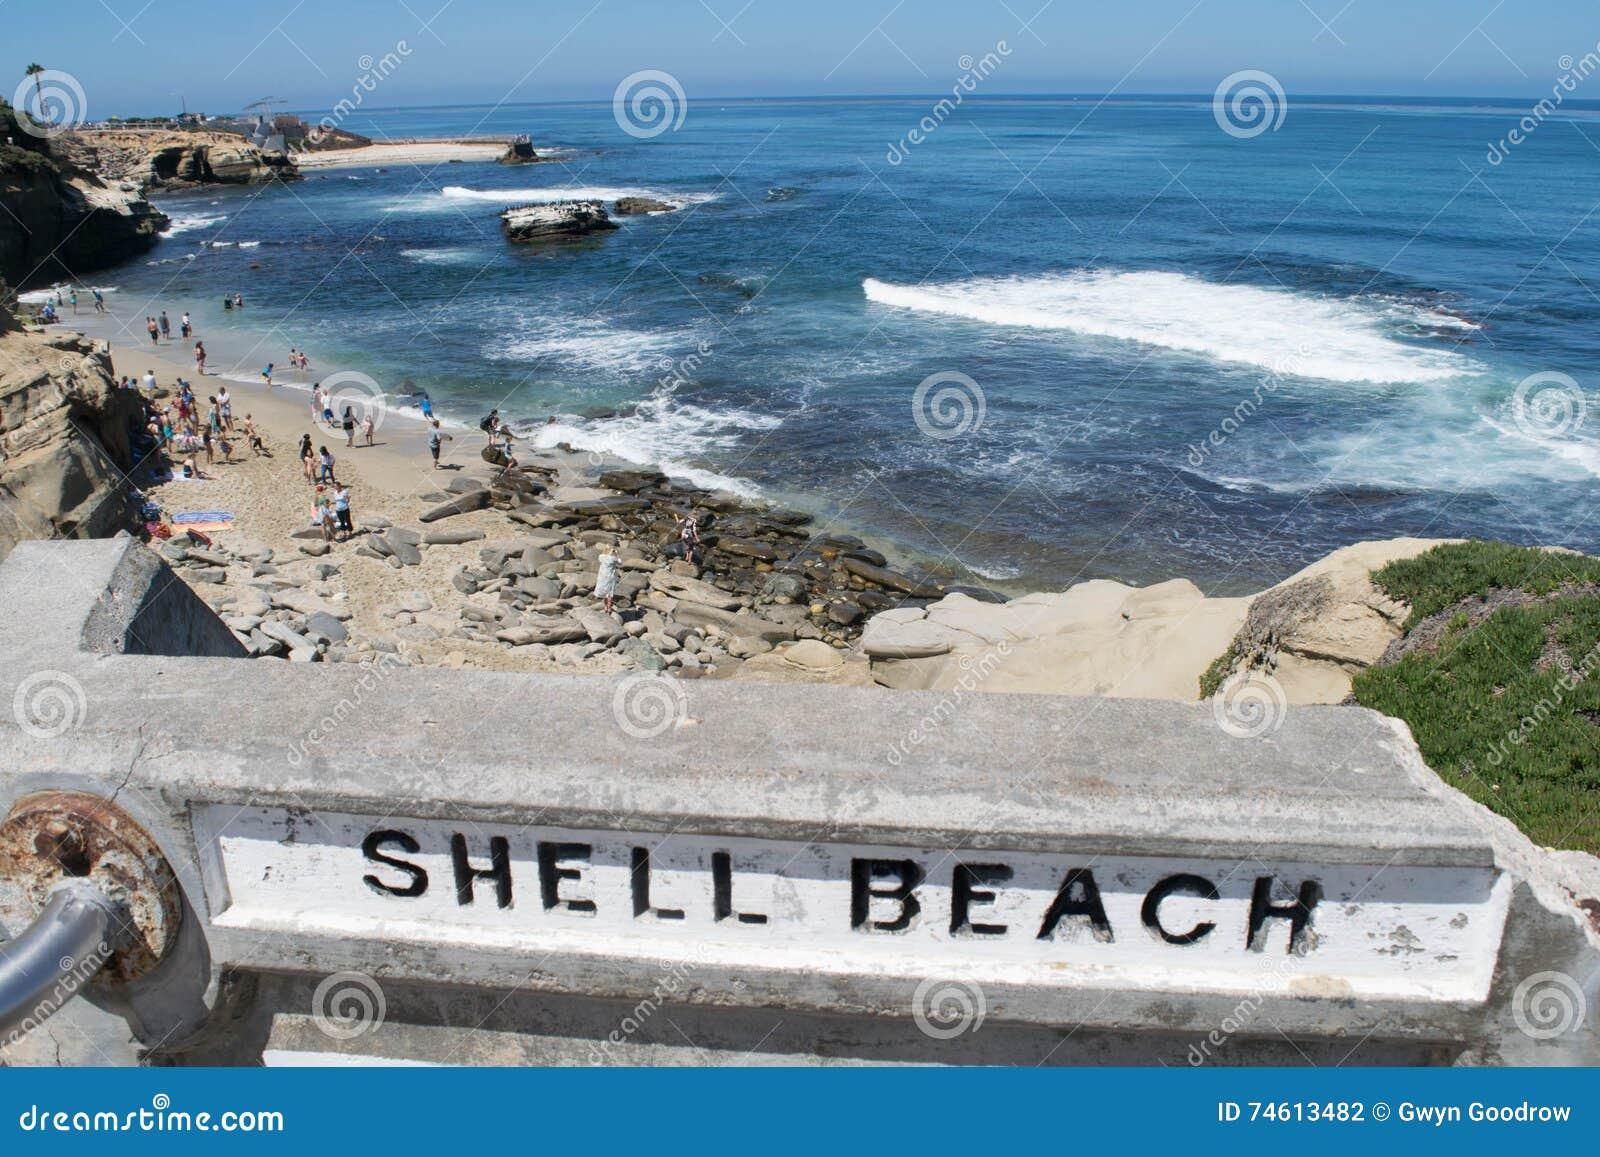 Shell Beach, La Jolla, Californië